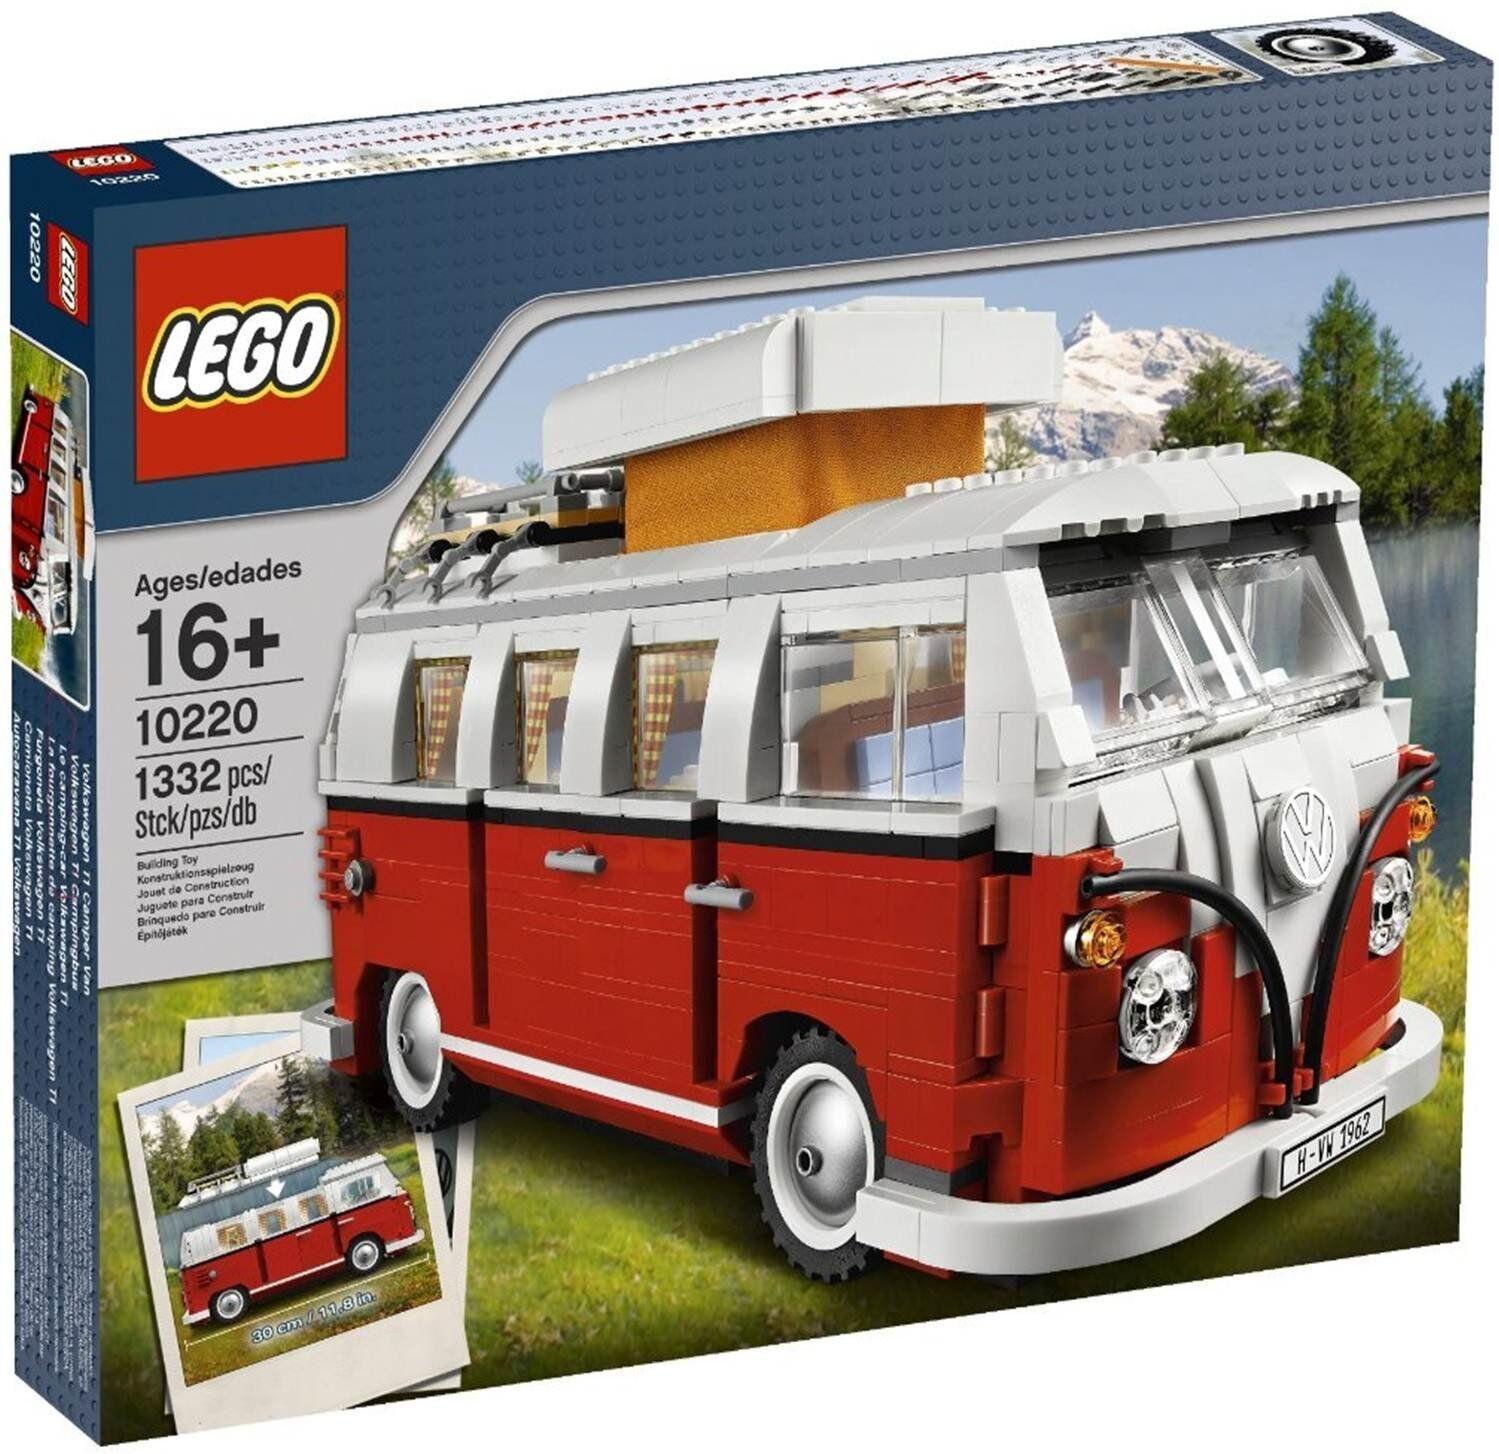 Véhicule Lego Volkswagen Creator Camionnette T1 Vw 10220 Nxyqcx4745 OPiukXZT